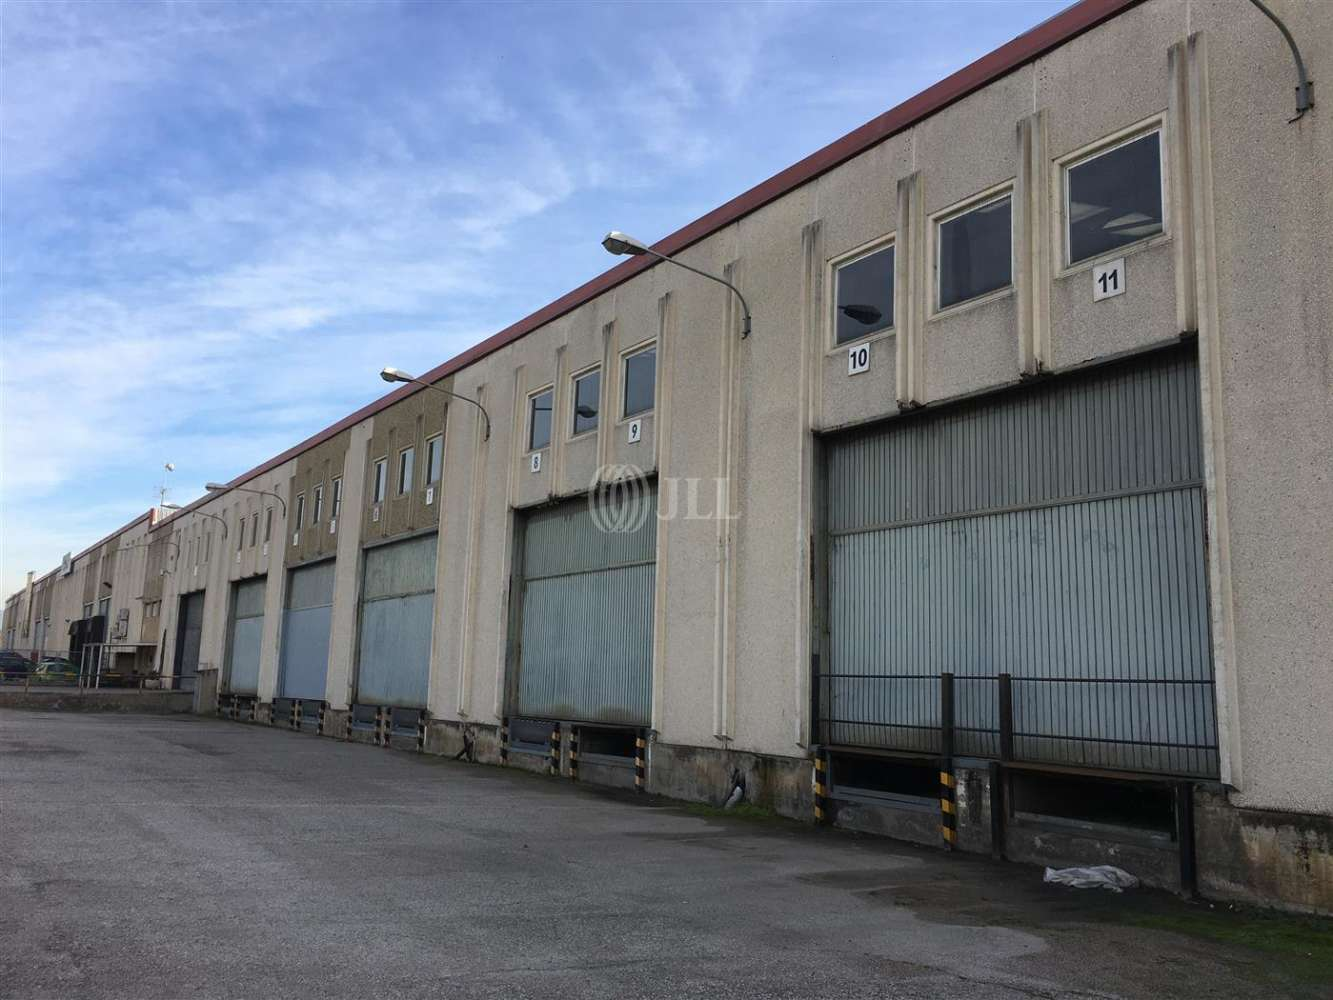 Naves industriales y logísticas Parets del vallès, 08150 - Nave Industrial - B0131 P.I CAN VOLART - 23958